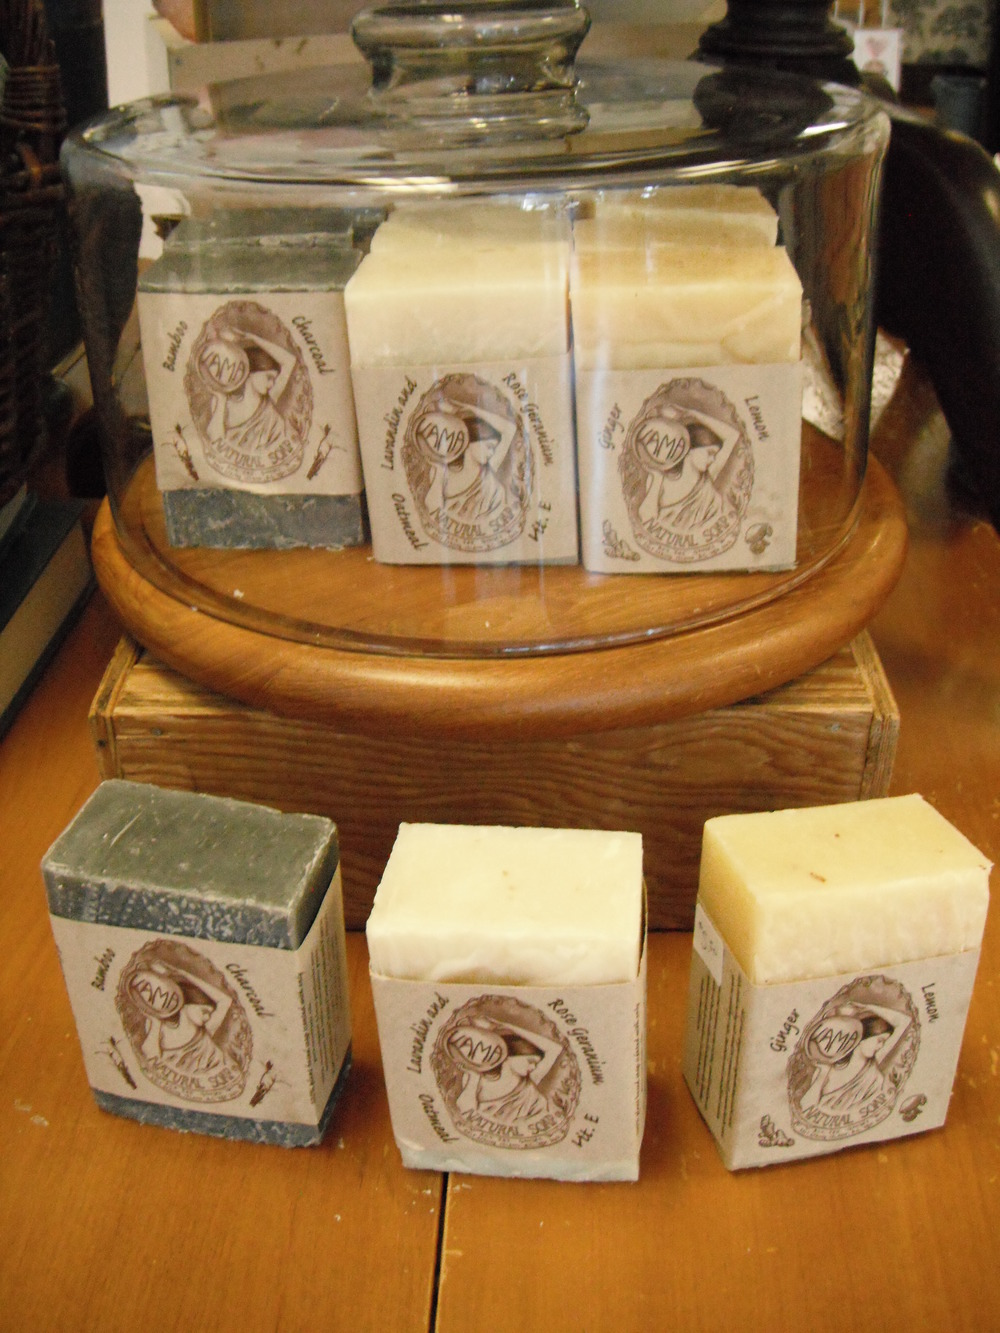 Kama Soap